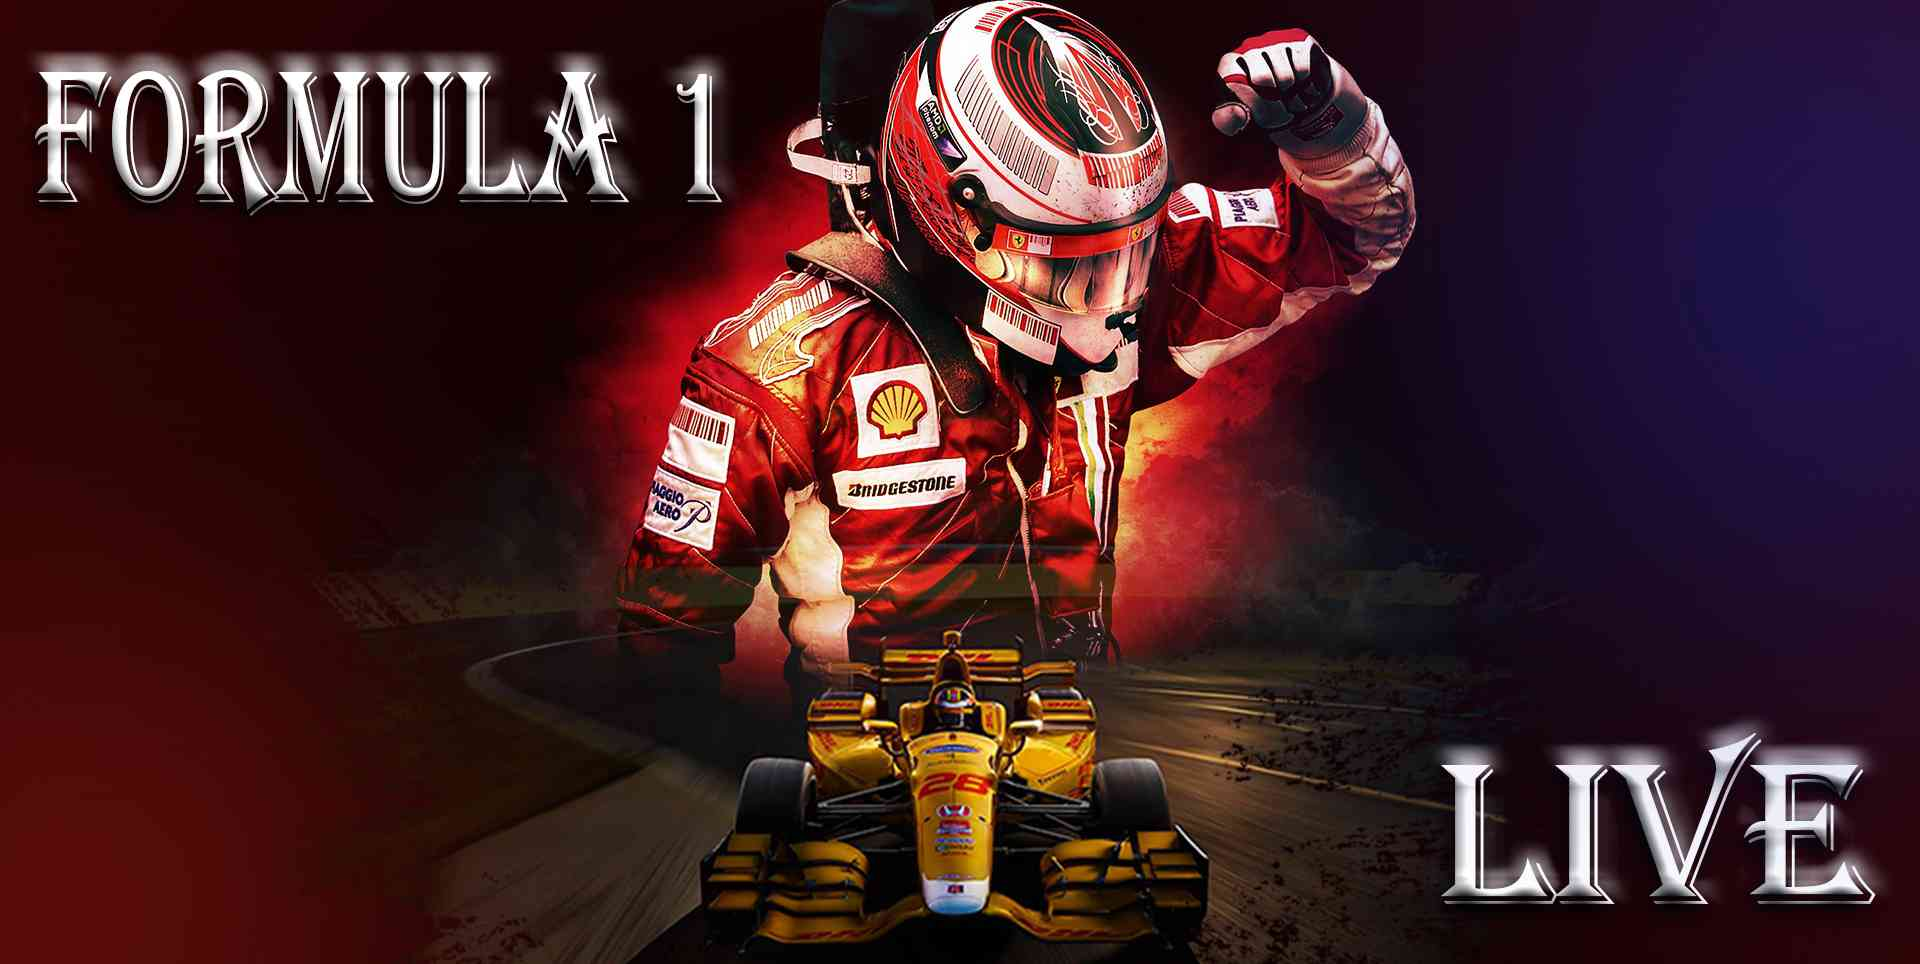 2016-race-formula-4-adac-rnd-2-live